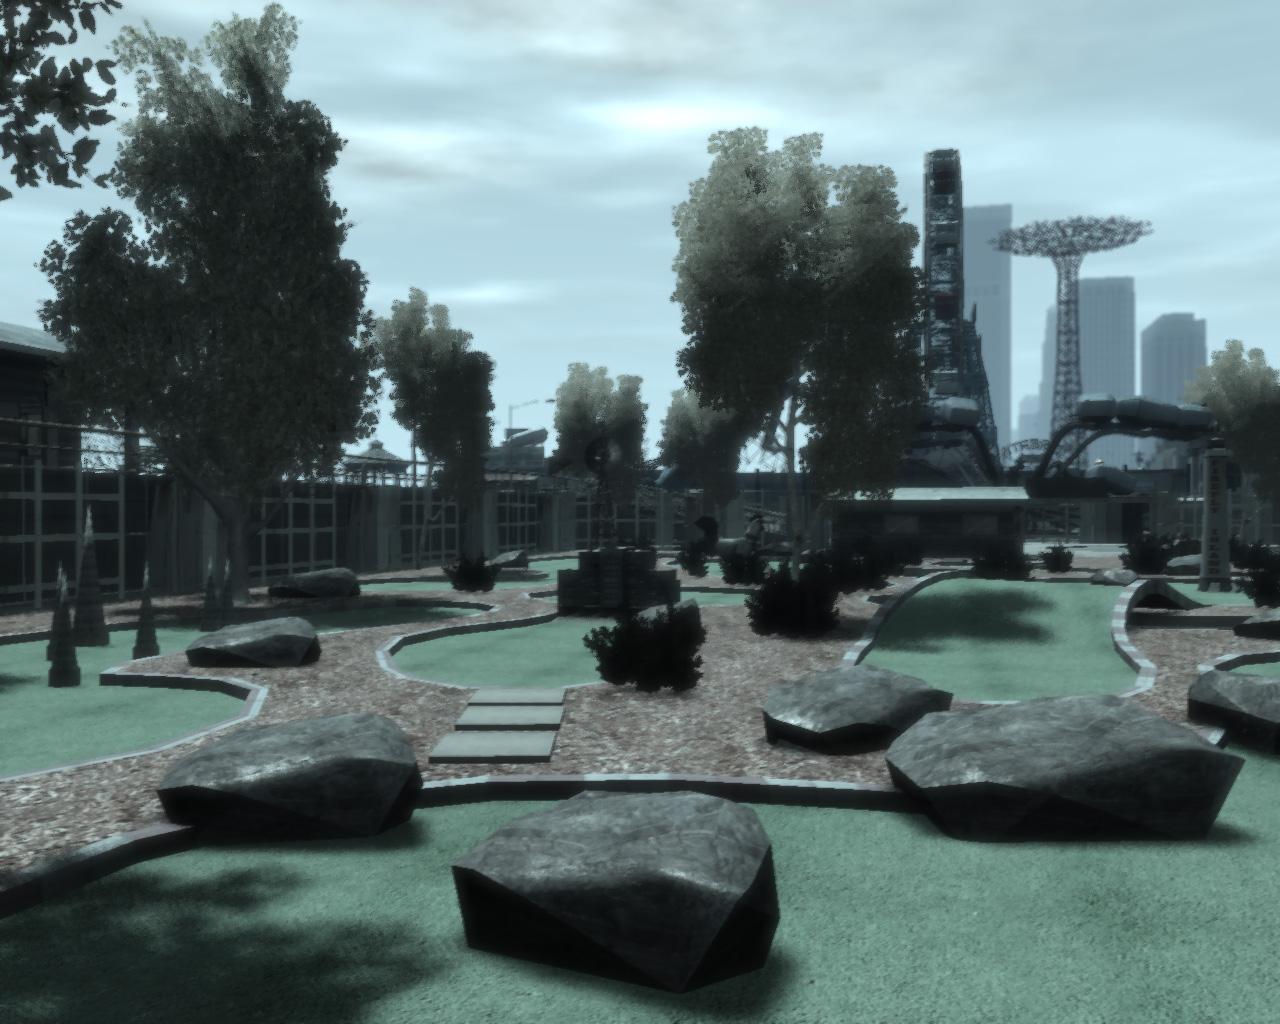 FireflyIsland-GTA4-miniaturegolfcourse.jpg